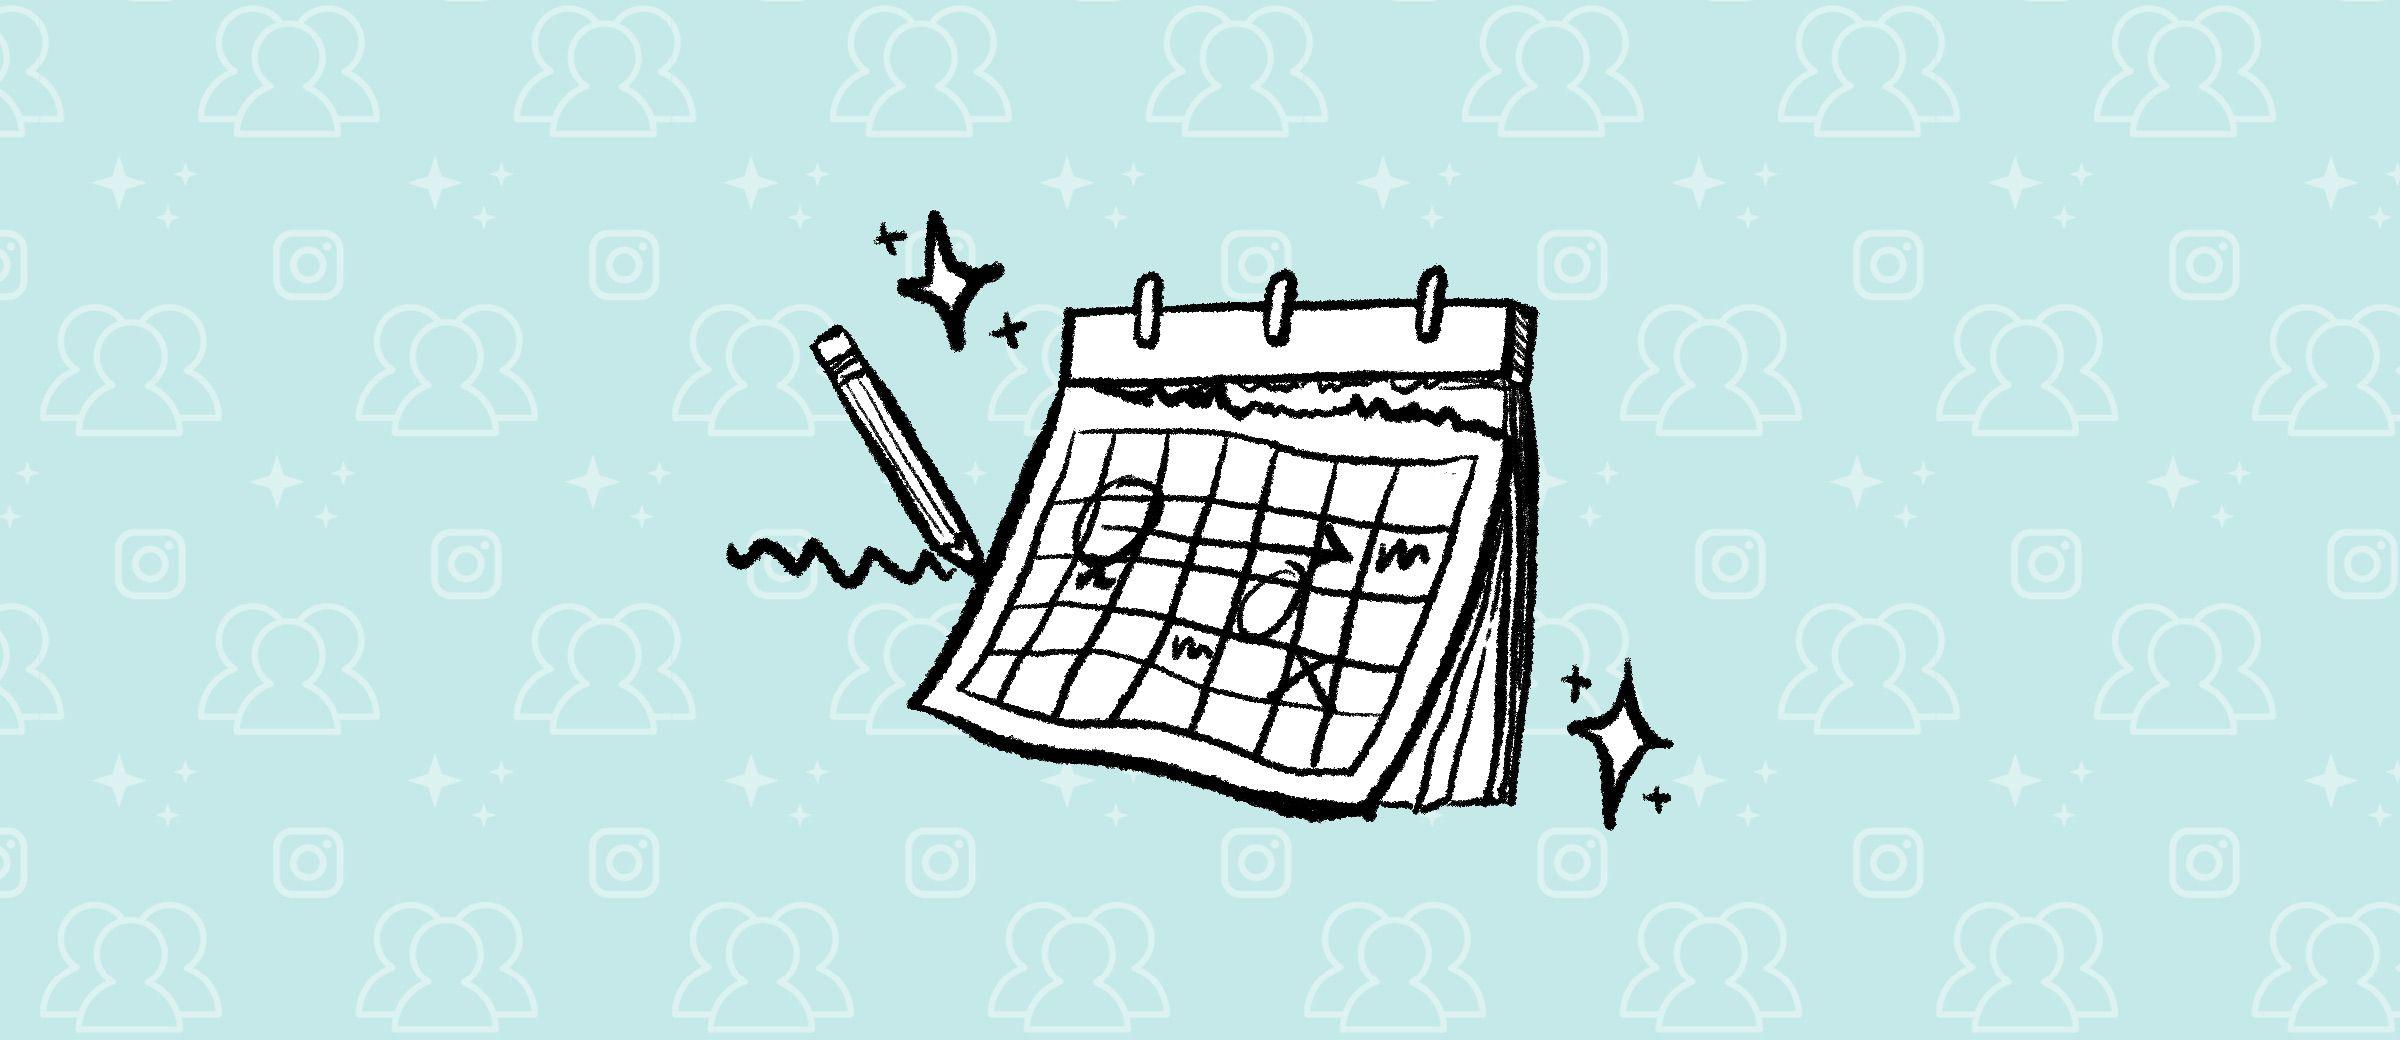 A pencil writing on a calendar